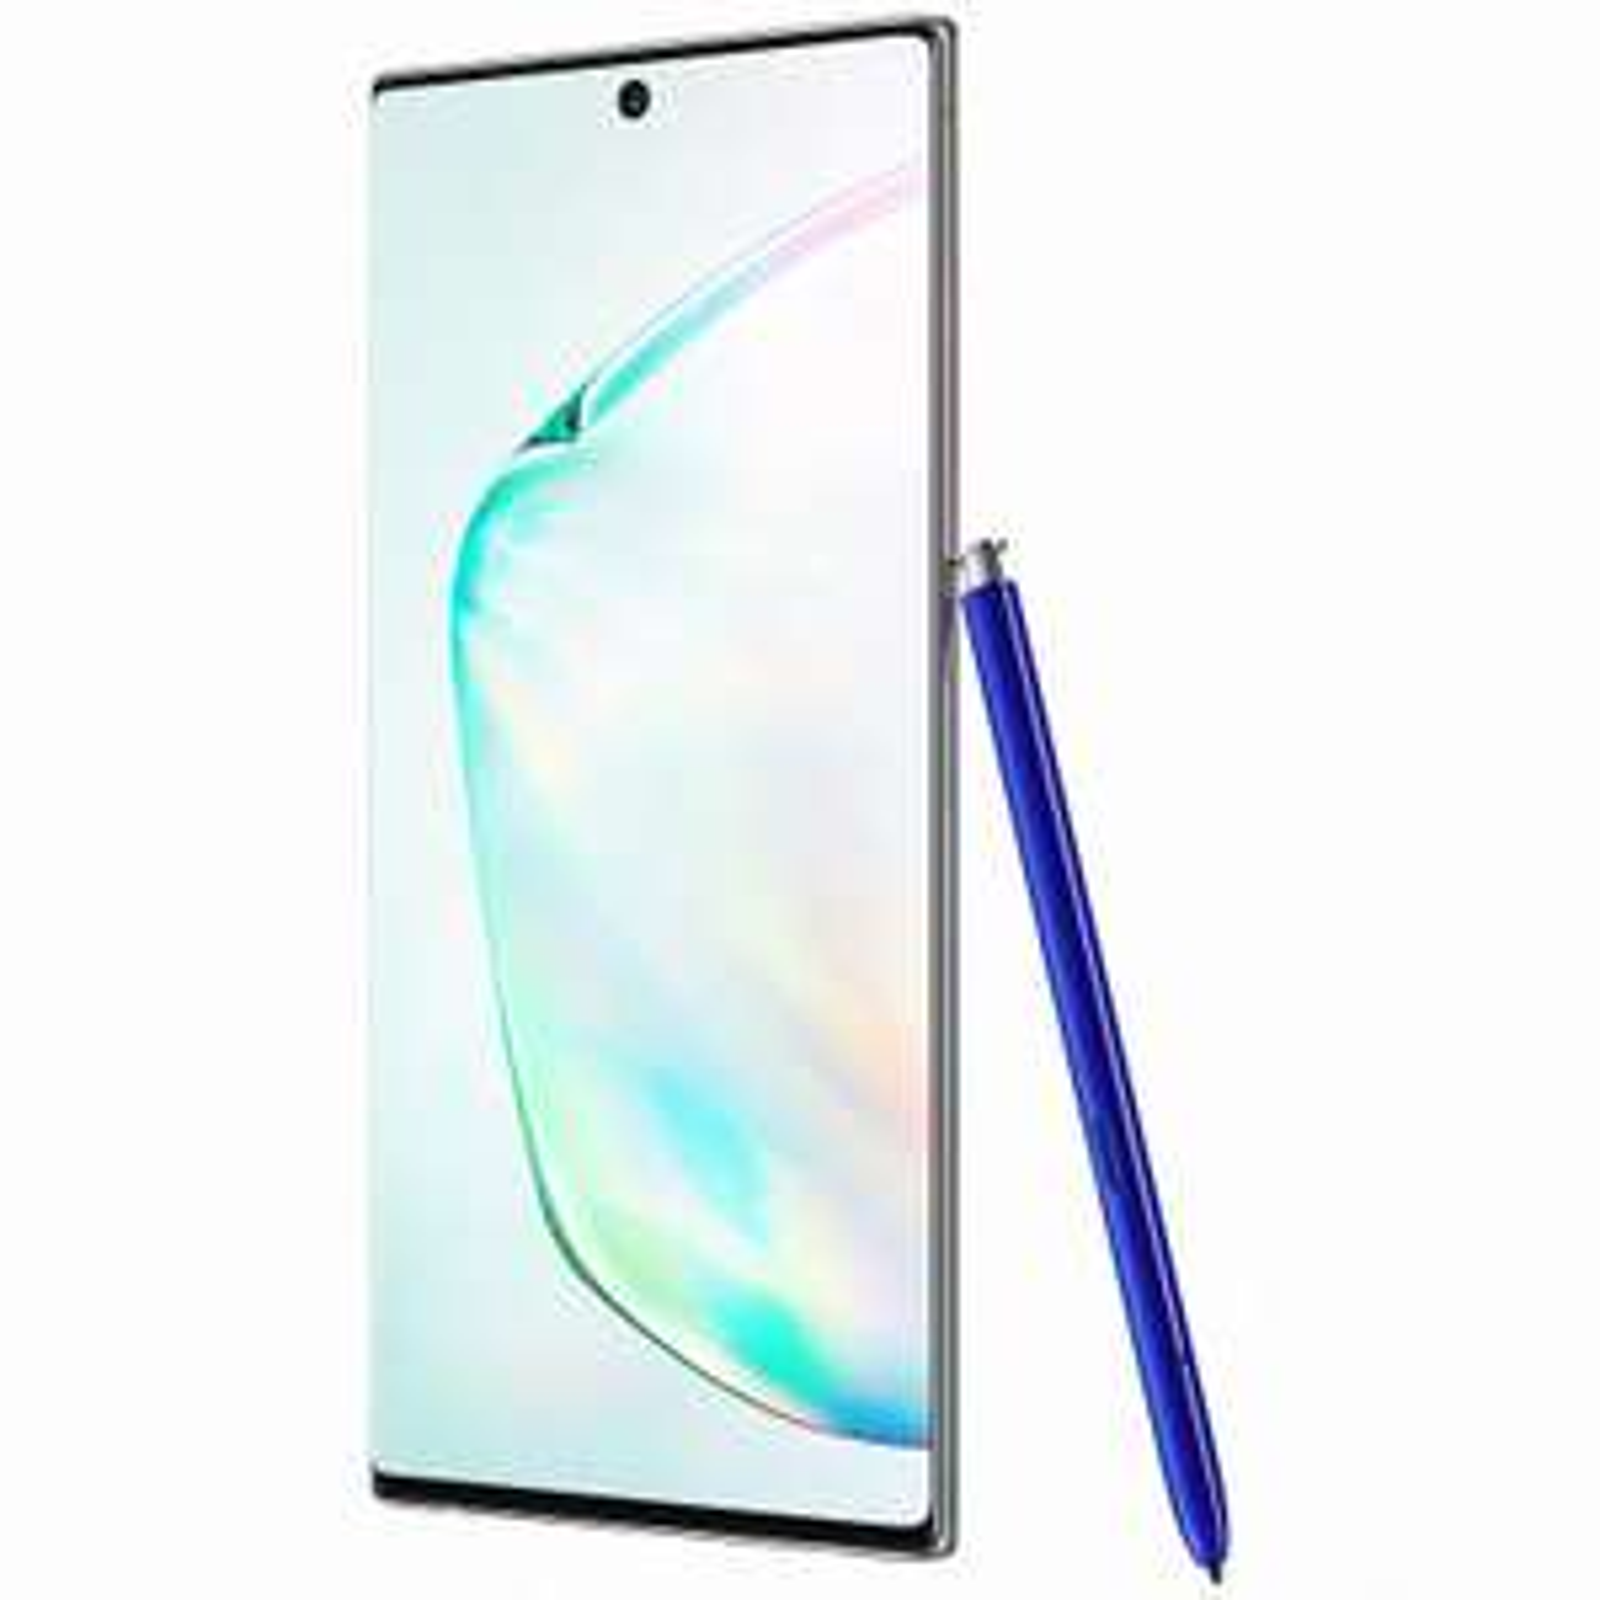 "Smartphone 6.8"" Samsung Galaxy Note 10+ Plus N9750 - Quad HD+, Snapdragon 855, RAM 12 Go, ROM 256 Go (Argent Stellaire)"